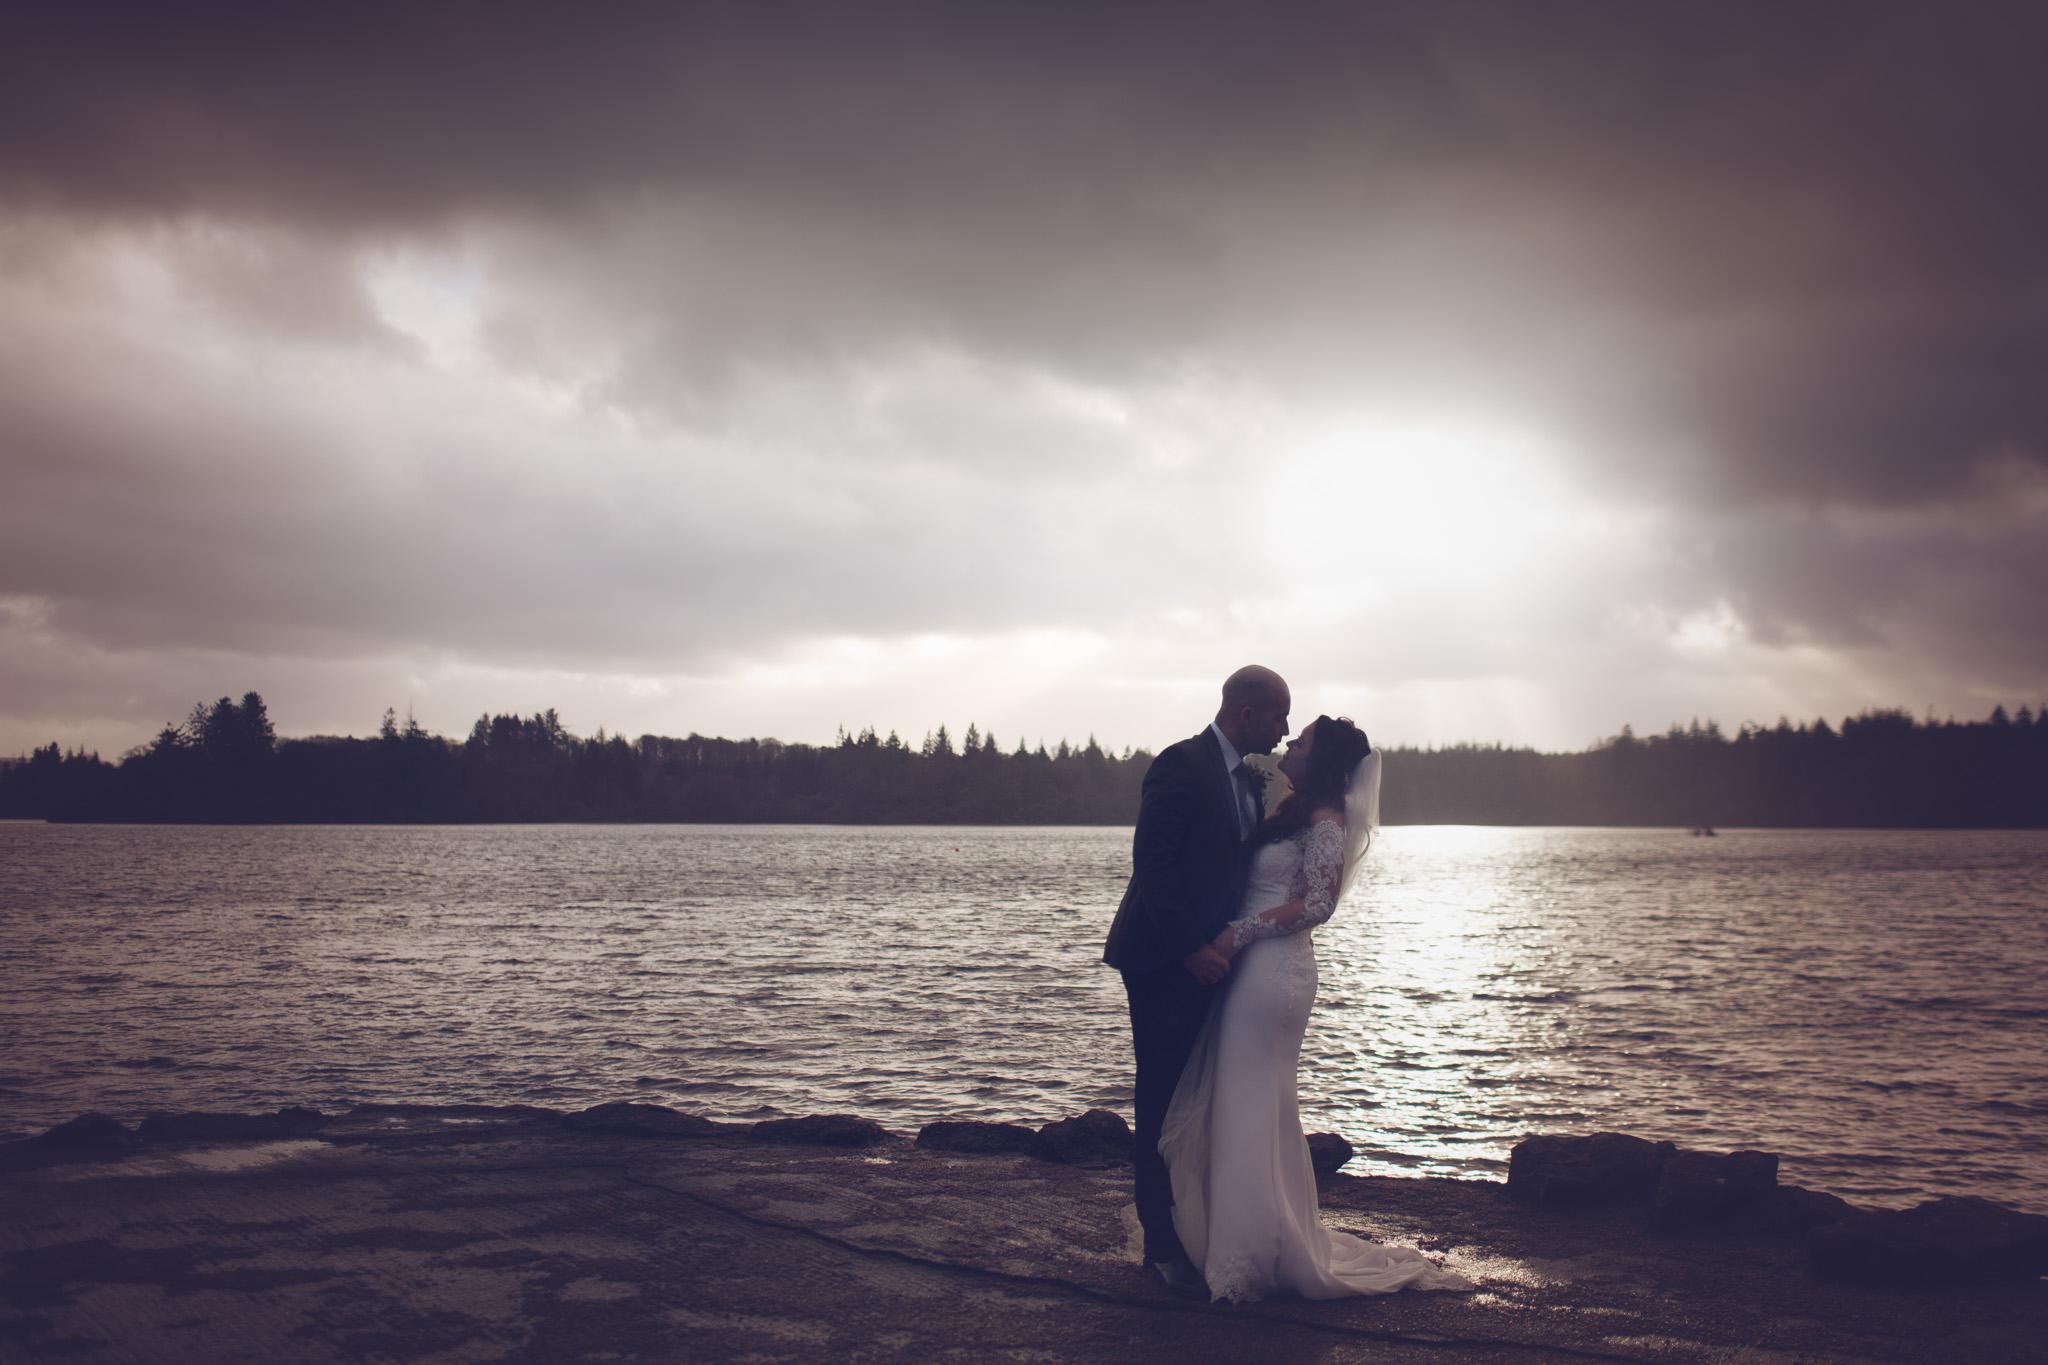 Mark_Barnes_Northern_Ireland_wedding_photographer_Harveys_Point_Donegall_Wedding_photography-Adam&Gemma-35.jpg